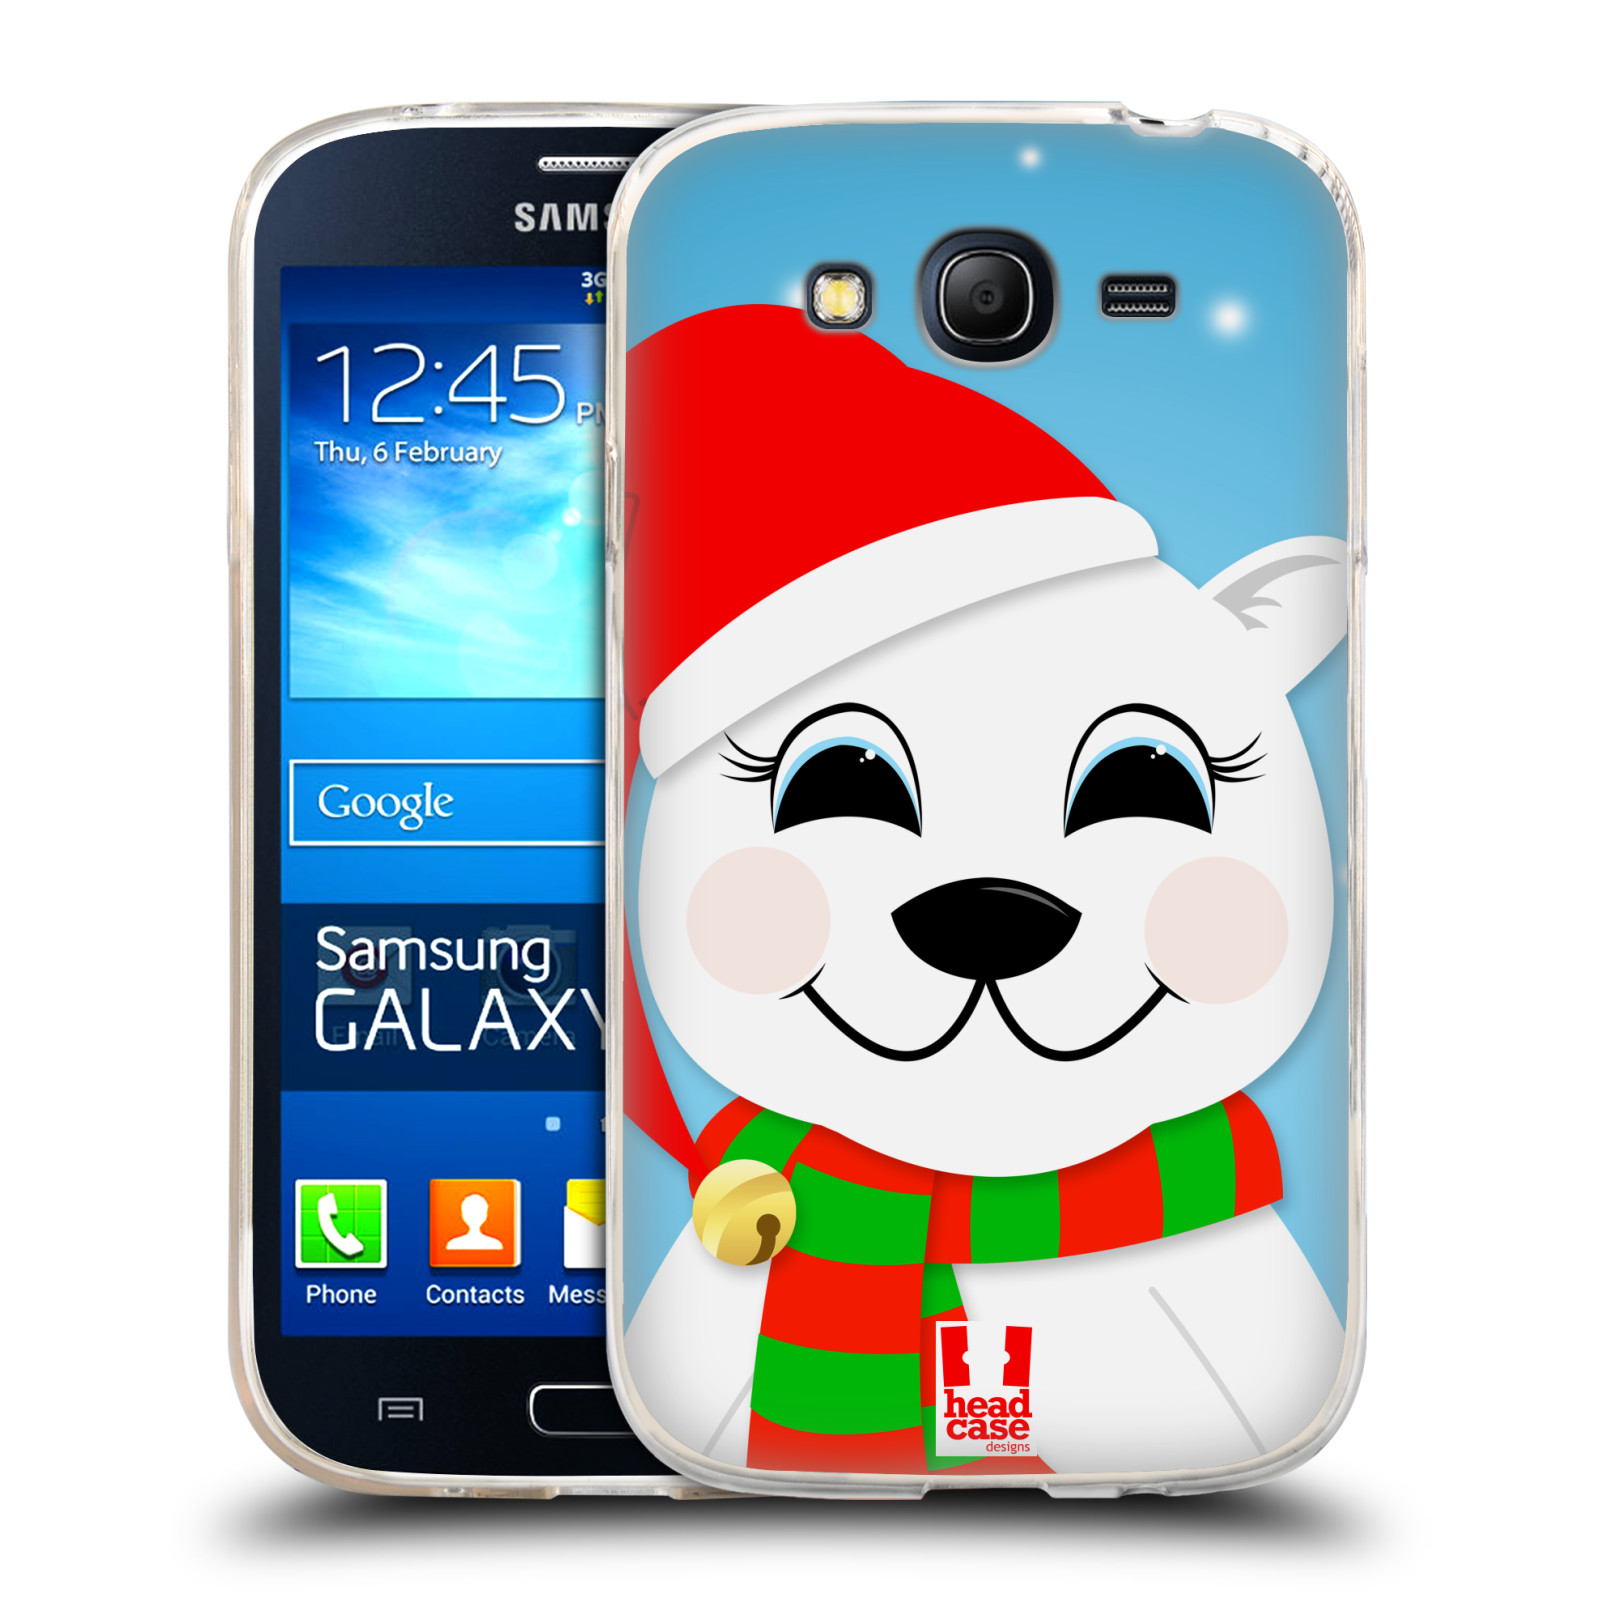 Silikonové pouzdro na mobil Samsung Galaxy Grand Neo HEAD CASE VÁNOCE POLÁRNÍ MÉĎA (Silikonový kryt či obal na mobilní telefon Samsung Galaxy Grand Neo GT-I9060)